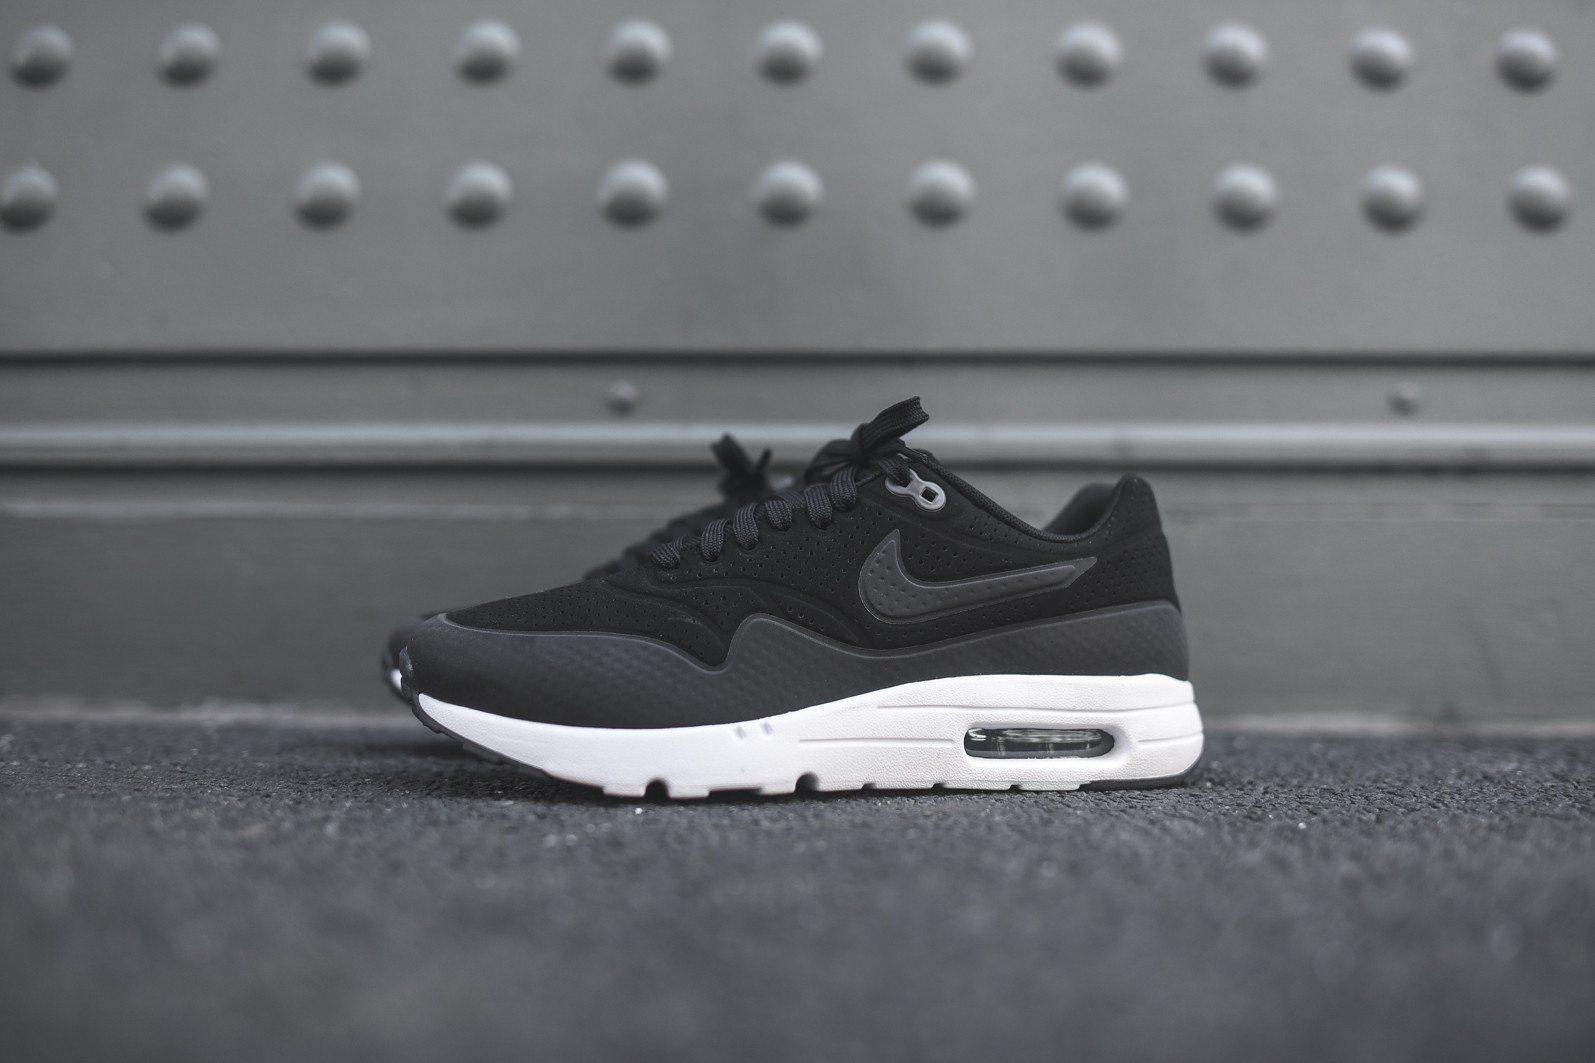 Nike Air Max 1 Ultra Moire Black Dark Grey White 3